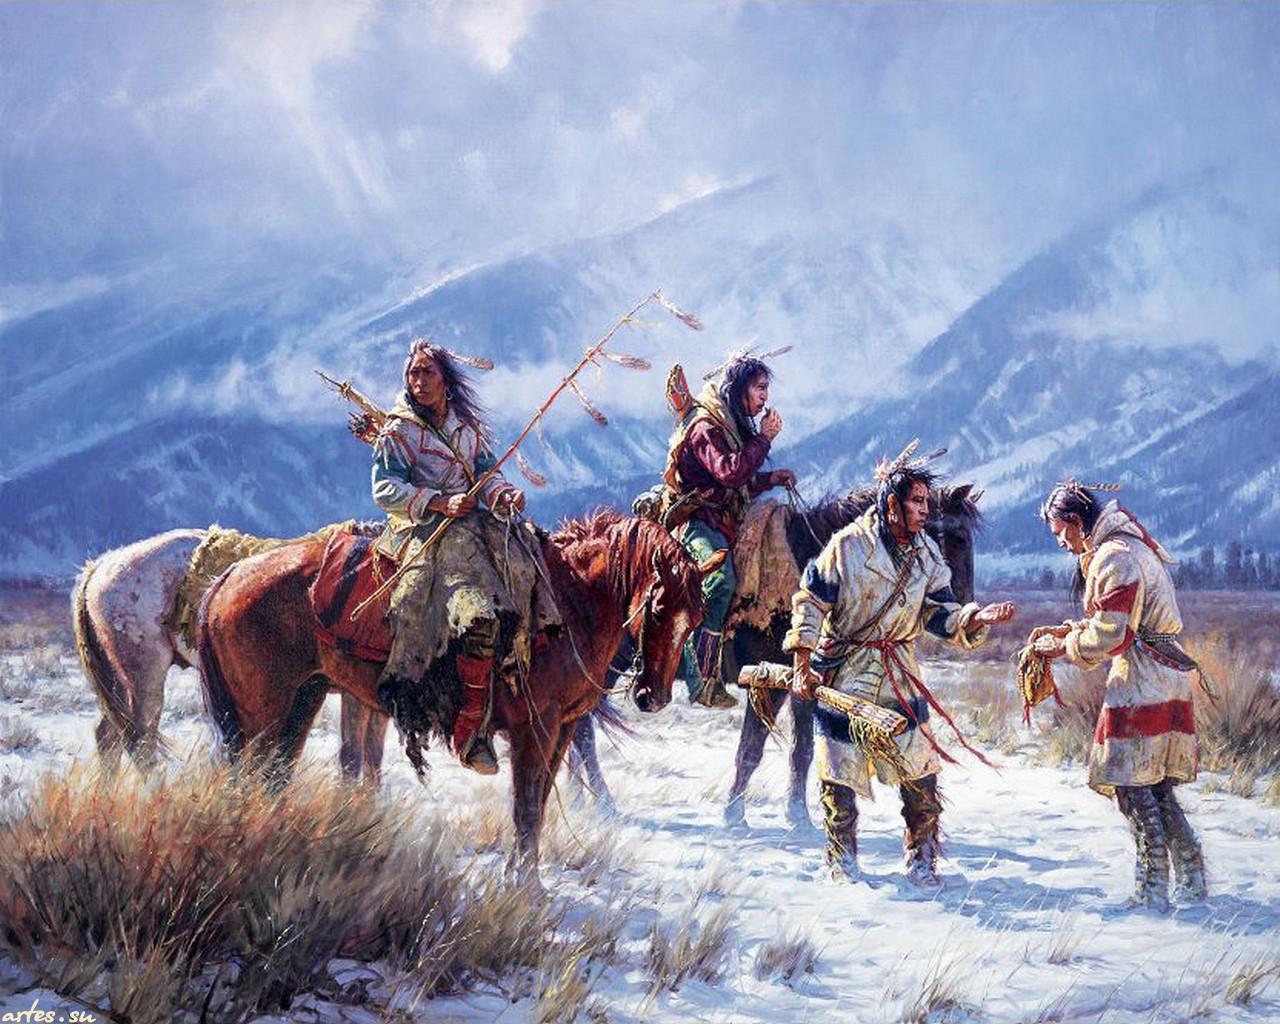 Artistic Native American Wallpaper 1280x1024 Artistic Native American 1280x1024